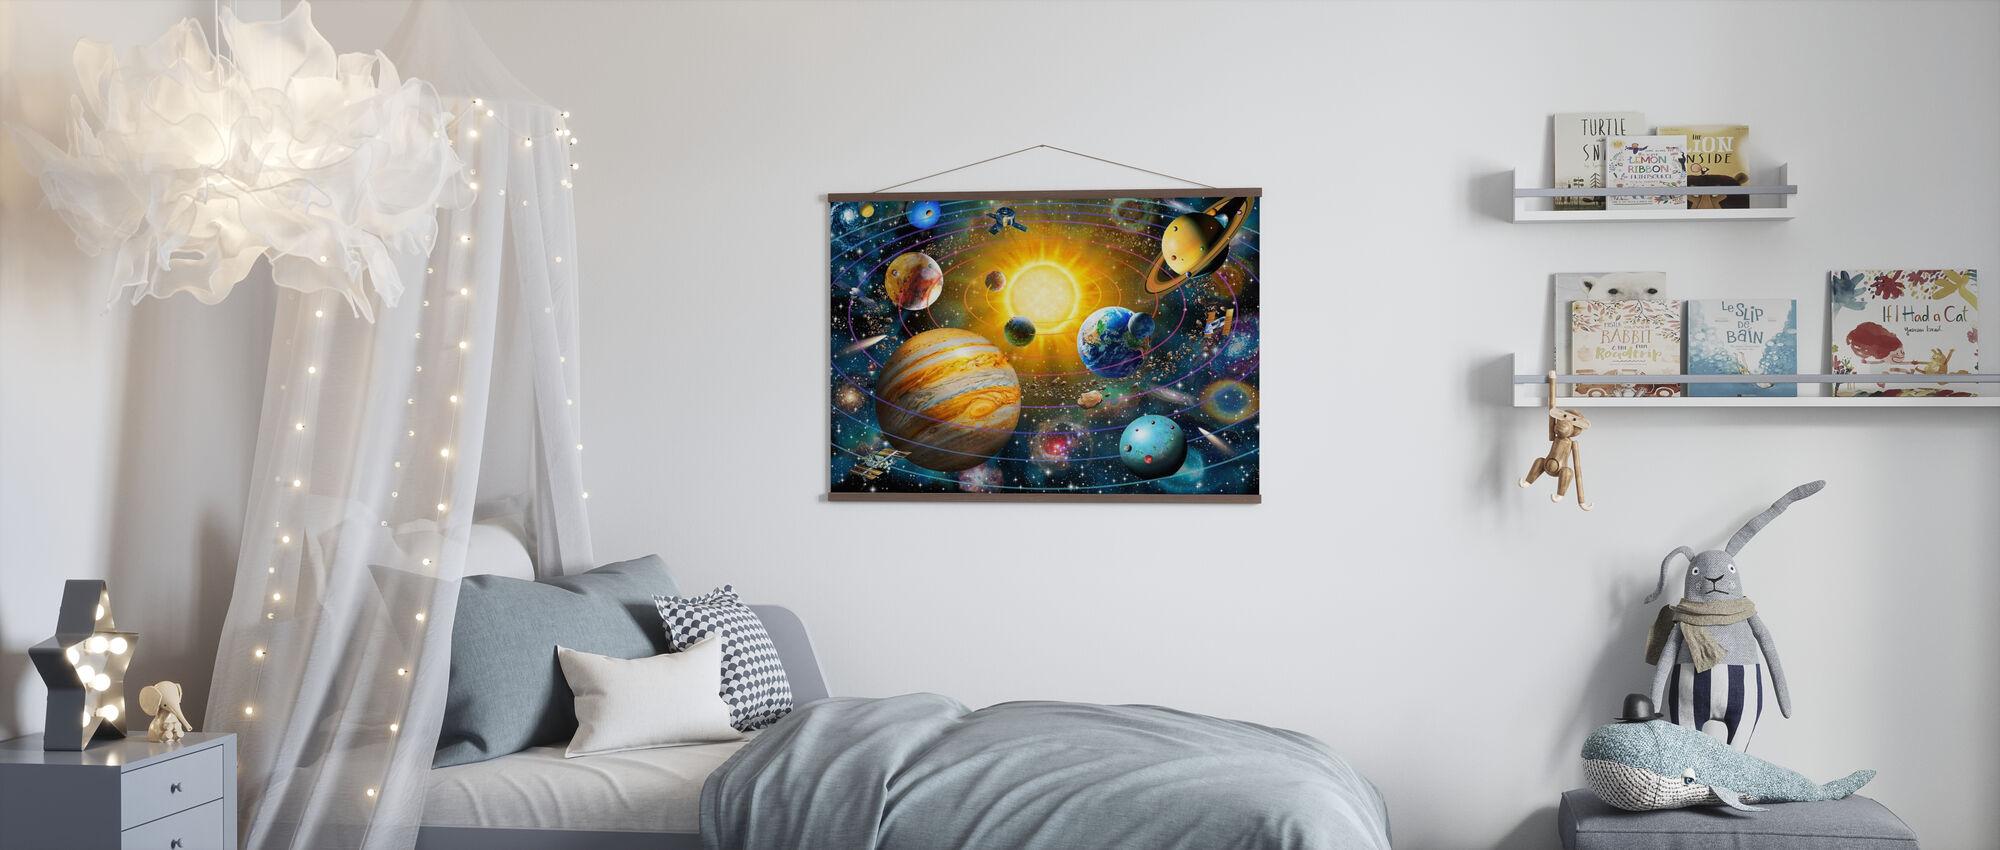 Norppa aurinkokunta - Juliste - Lastenhuone